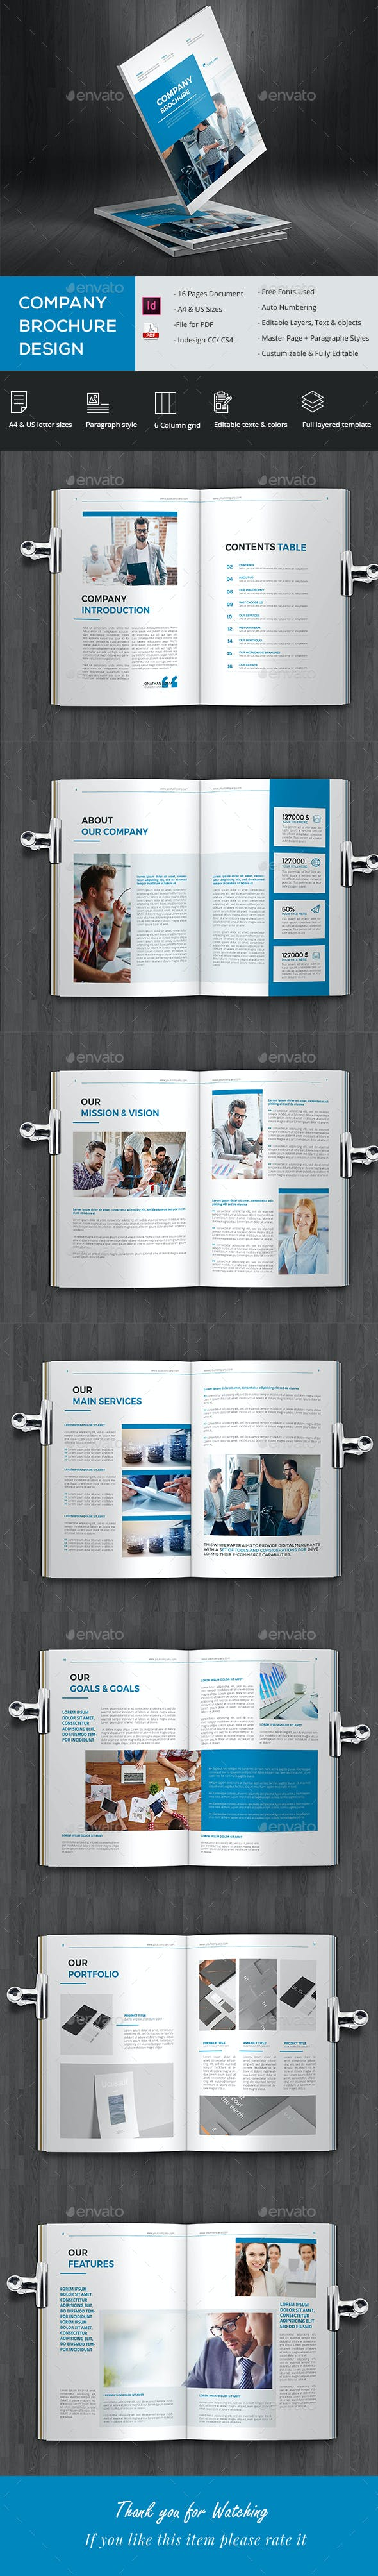 Simple Company Brochure